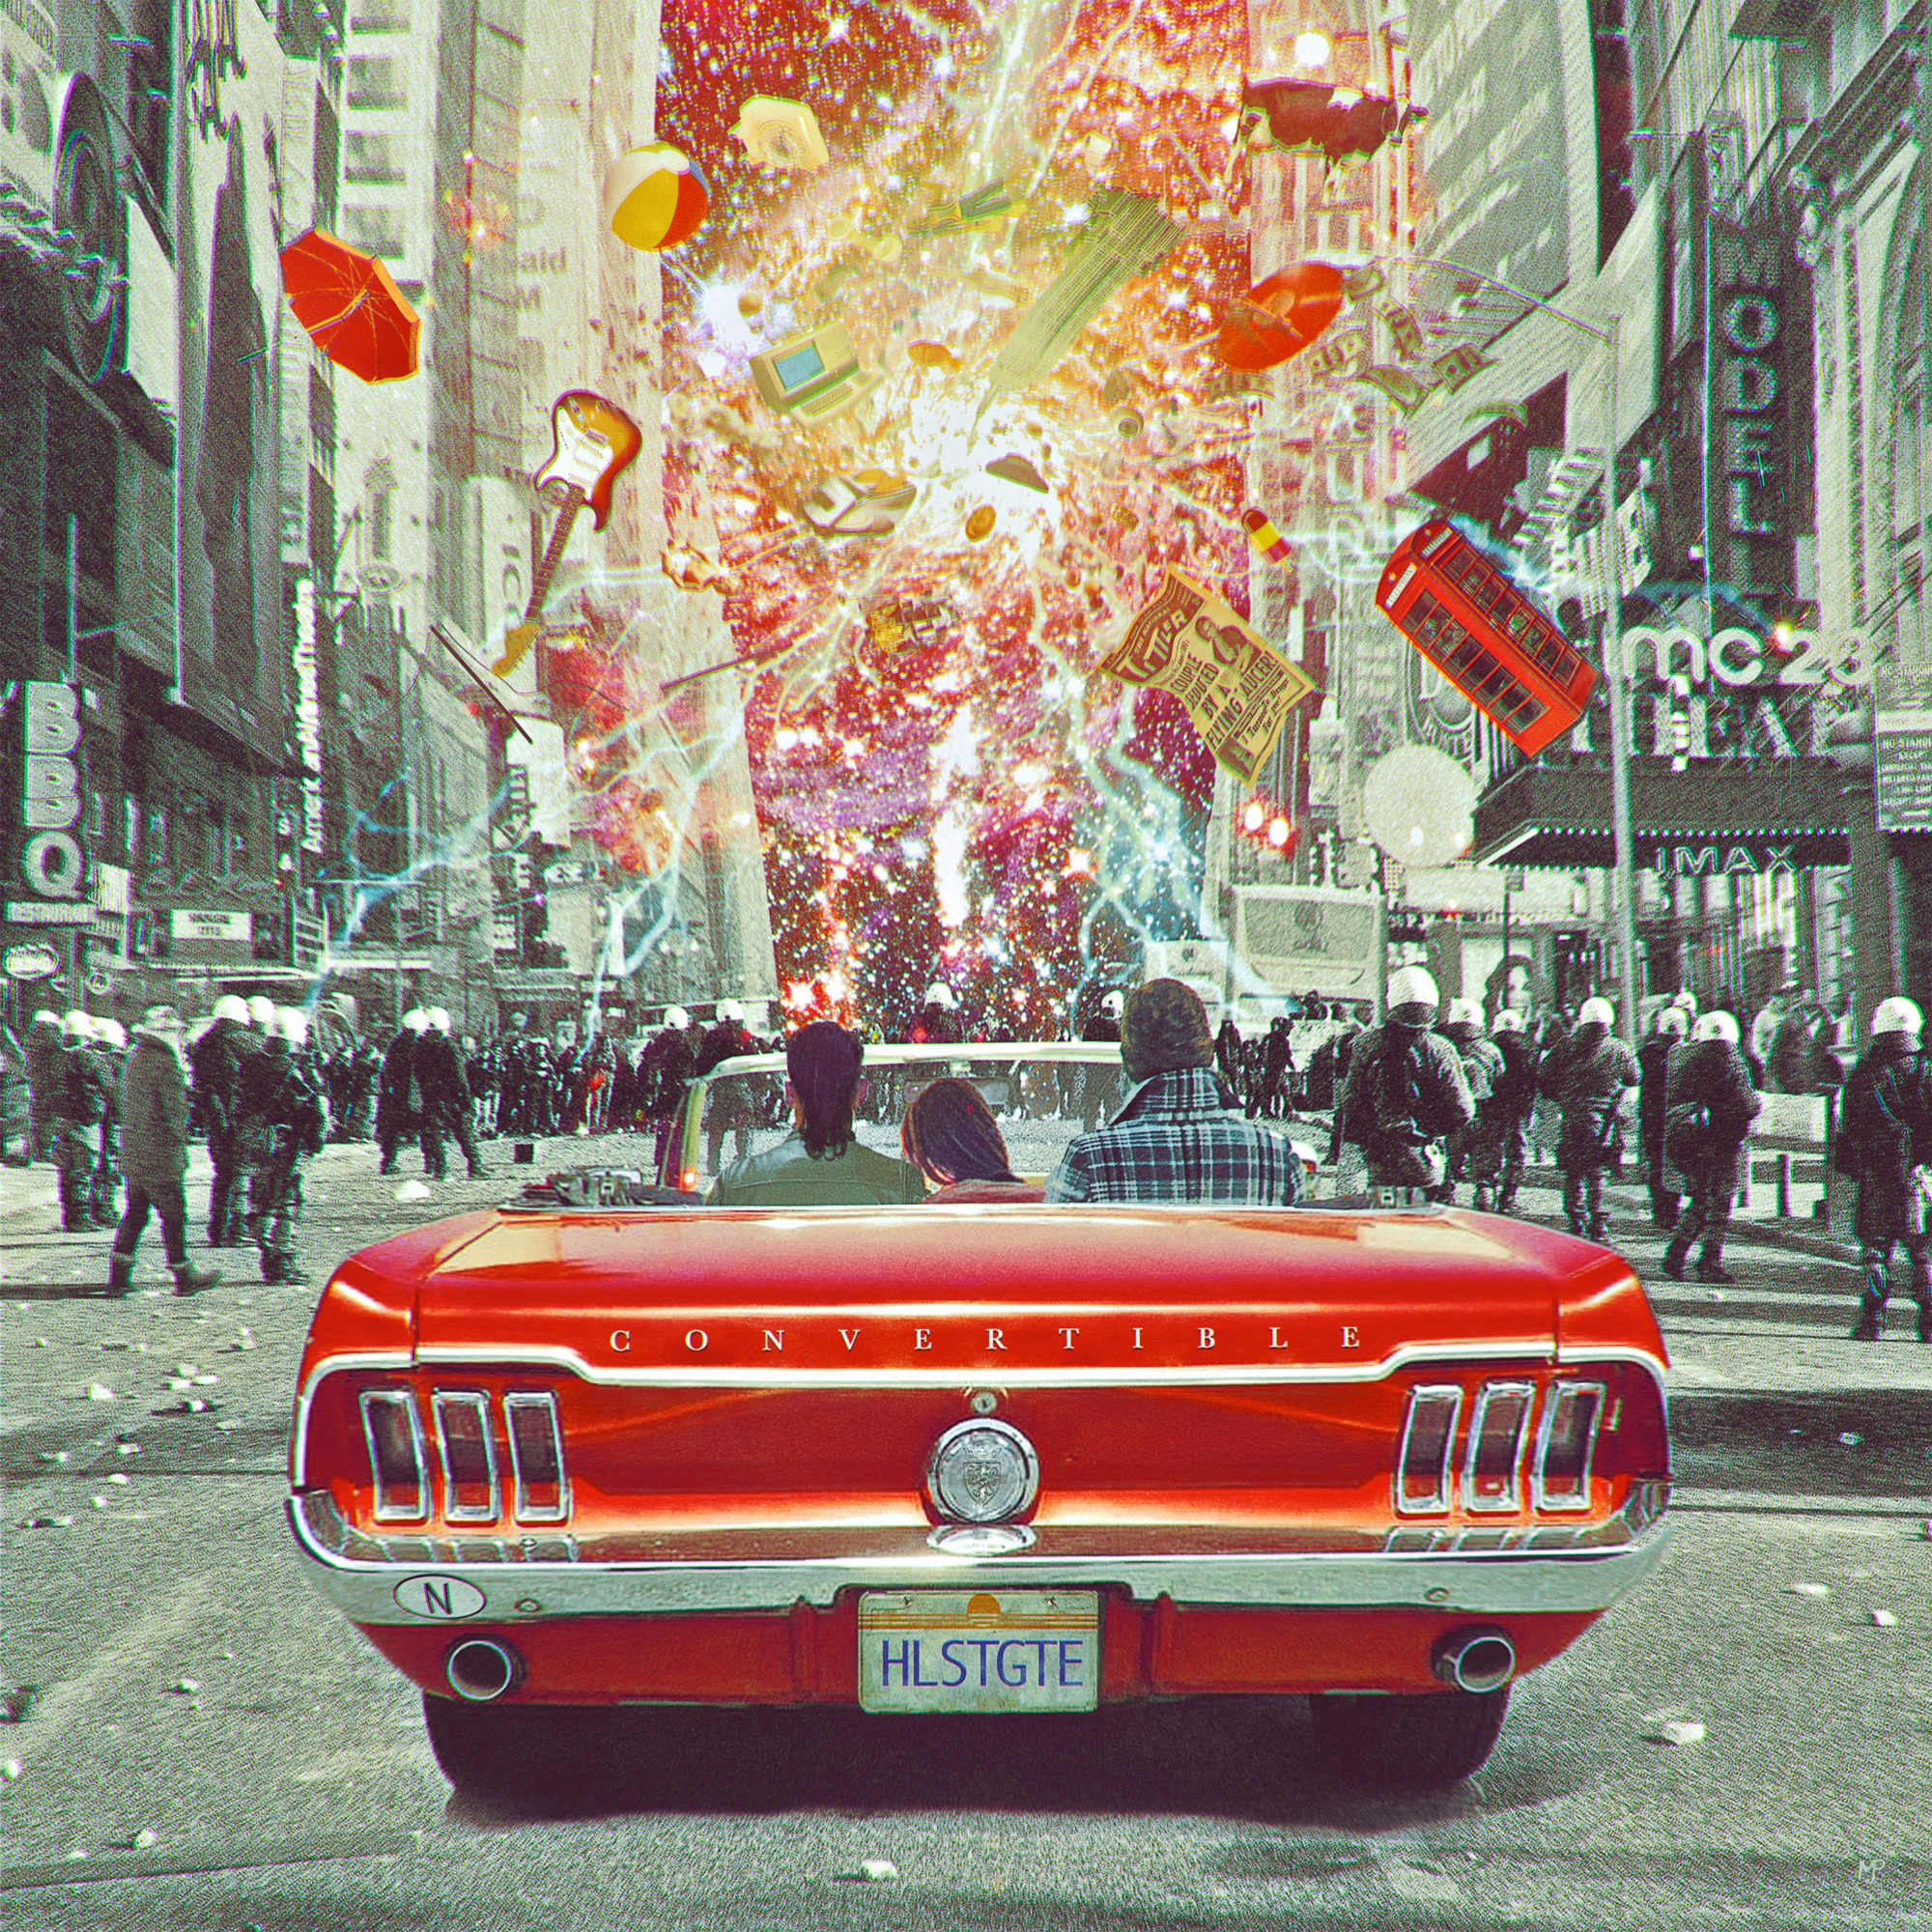 Convertible Band Holst Gate Hans Platzgumer Album Cover